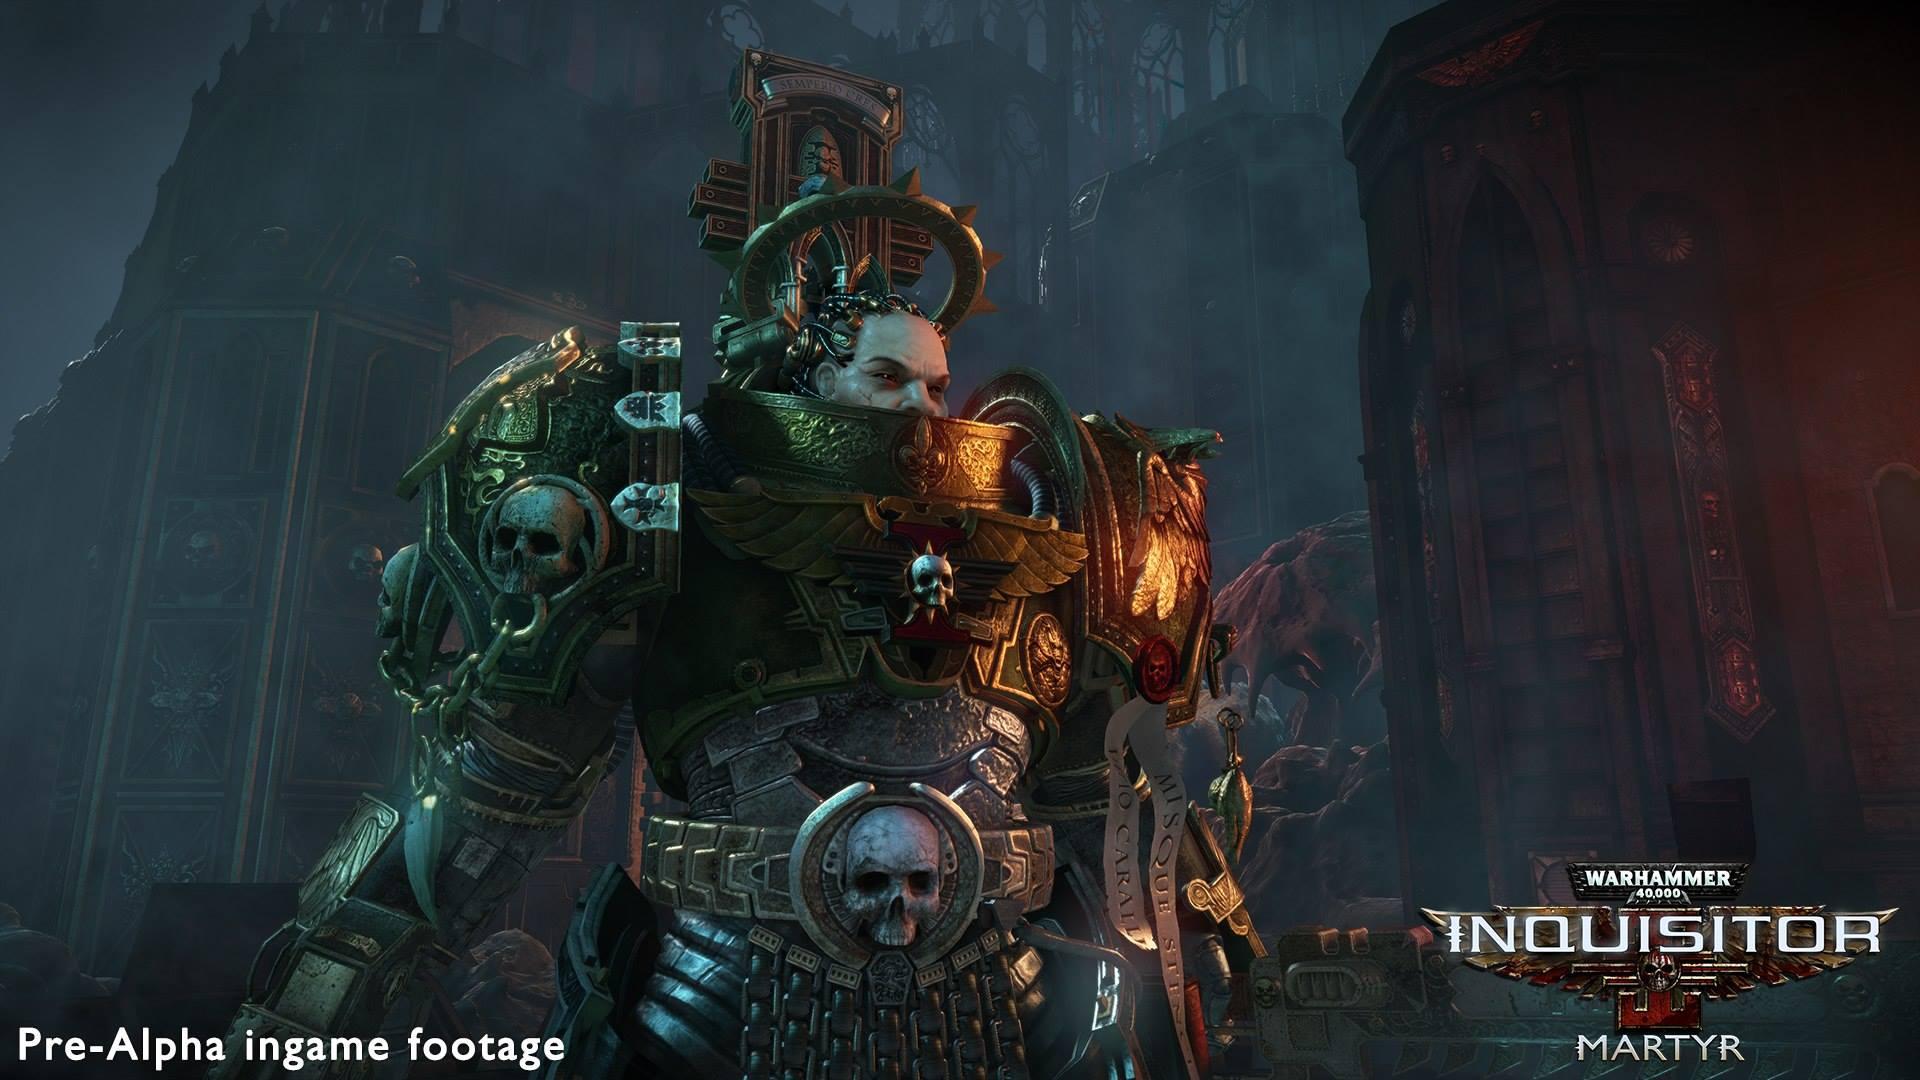 [Jeu vidéo] Warhammer 40,000: Inquisitor – Martyr 94432611794054869665303068940672043568048300780o